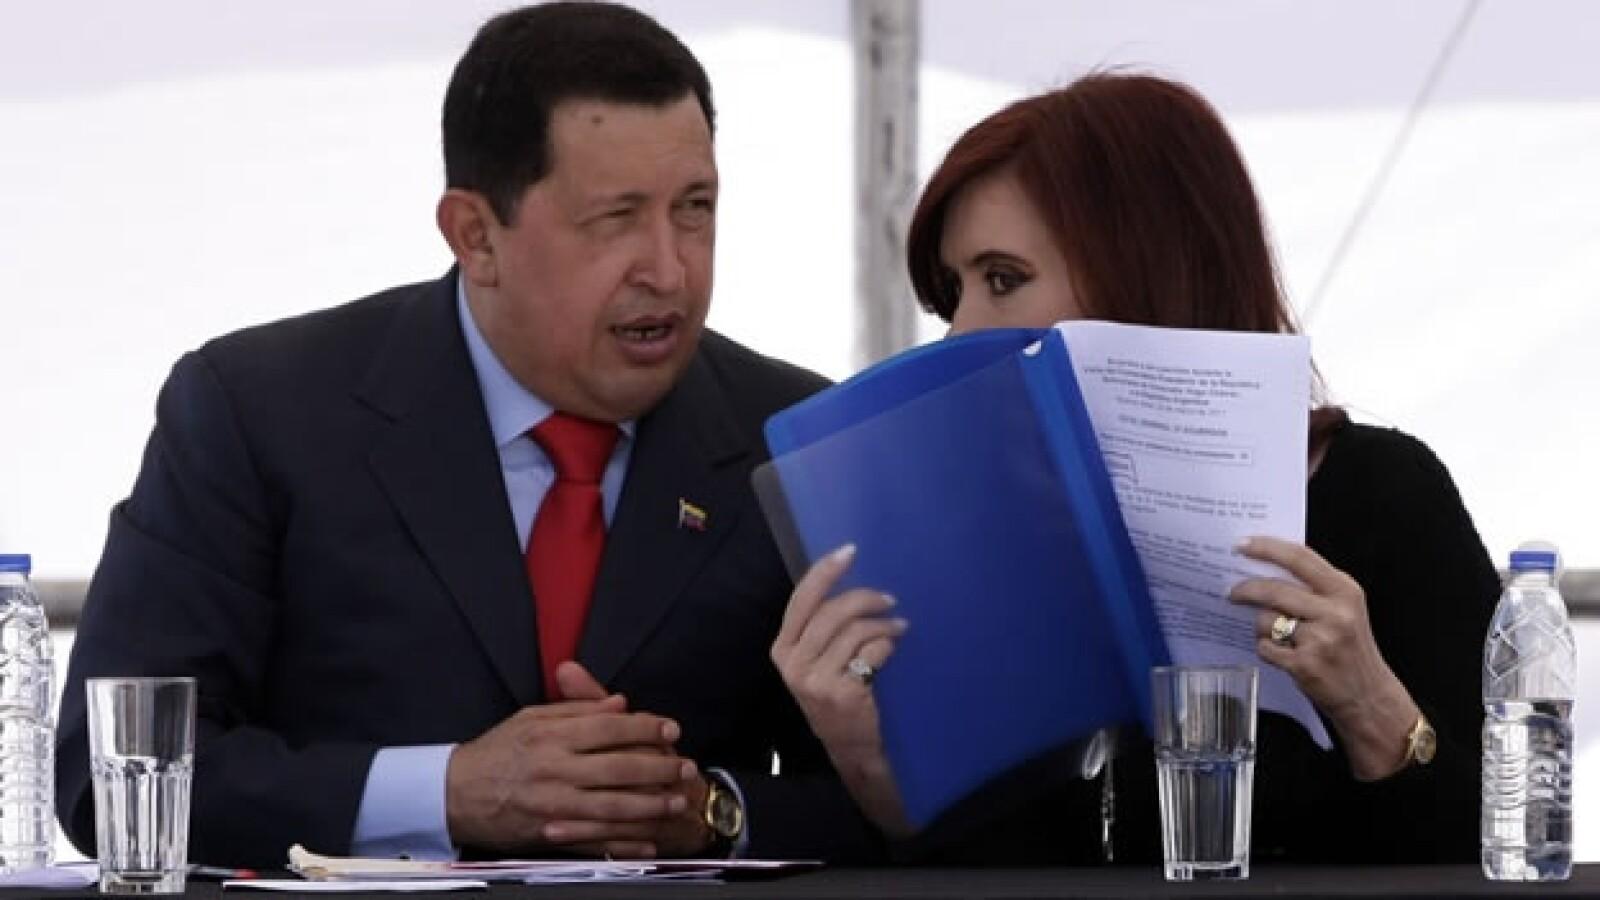 Chávez - Cristina Fernández